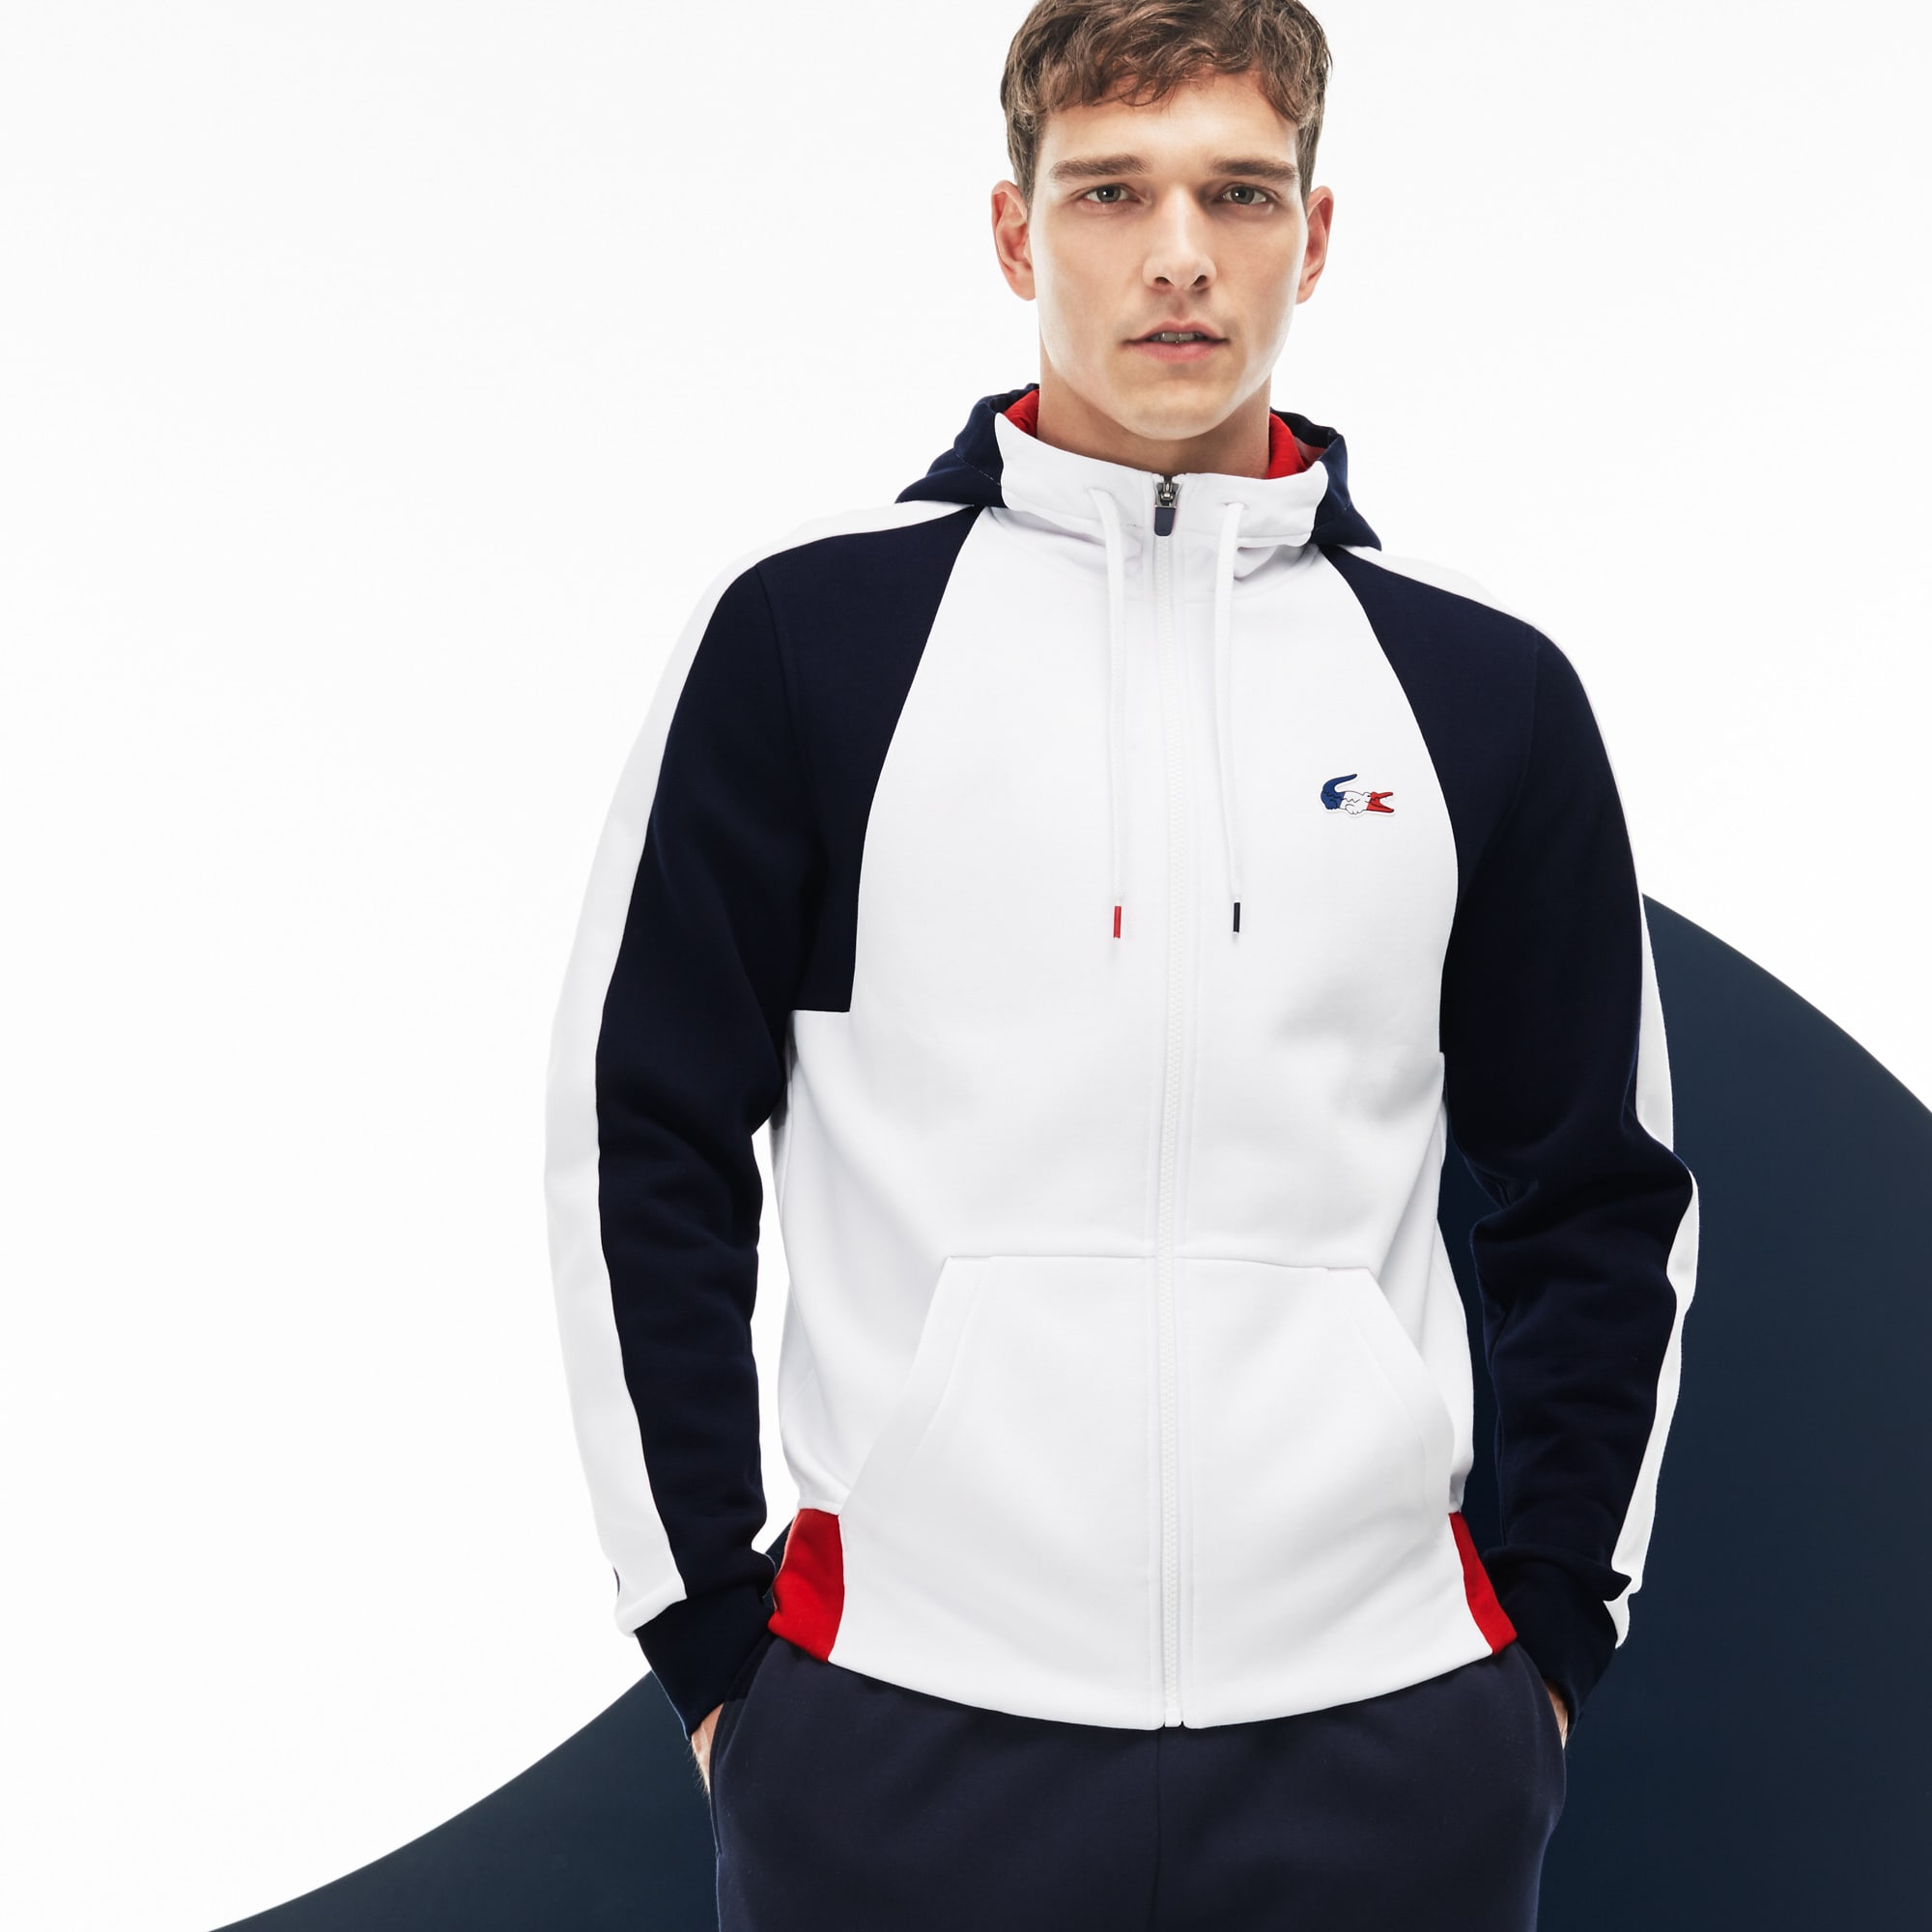 Men's Lacoste FRENCH SPORTING SPIRIT Edition Colorblock Fleece Sweatshirt